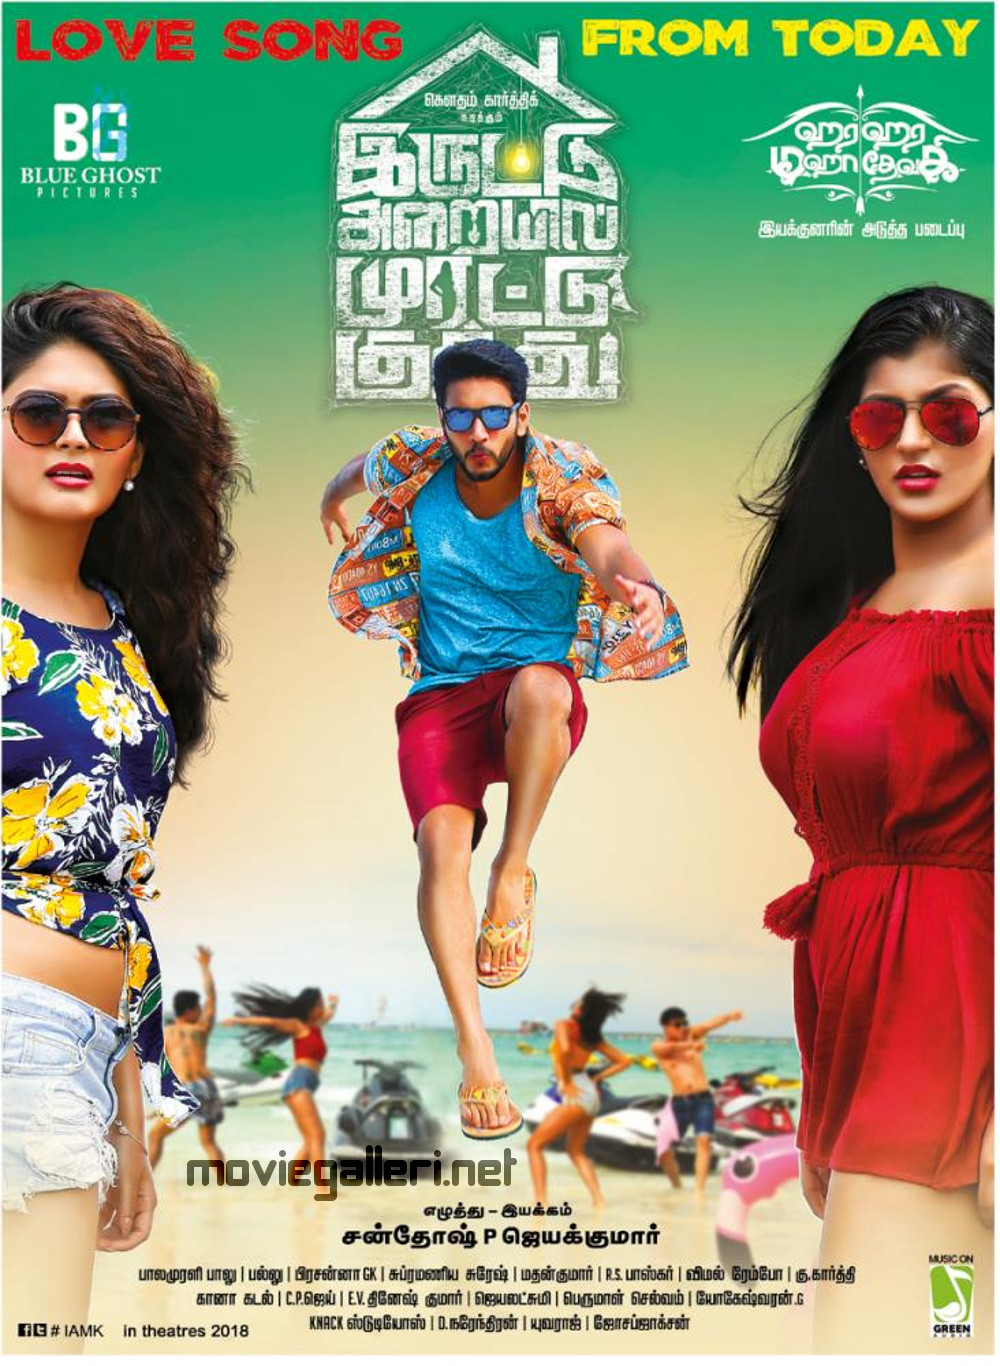 Iruttu Arayil Murattu Kuthu Love Song From Today Posters